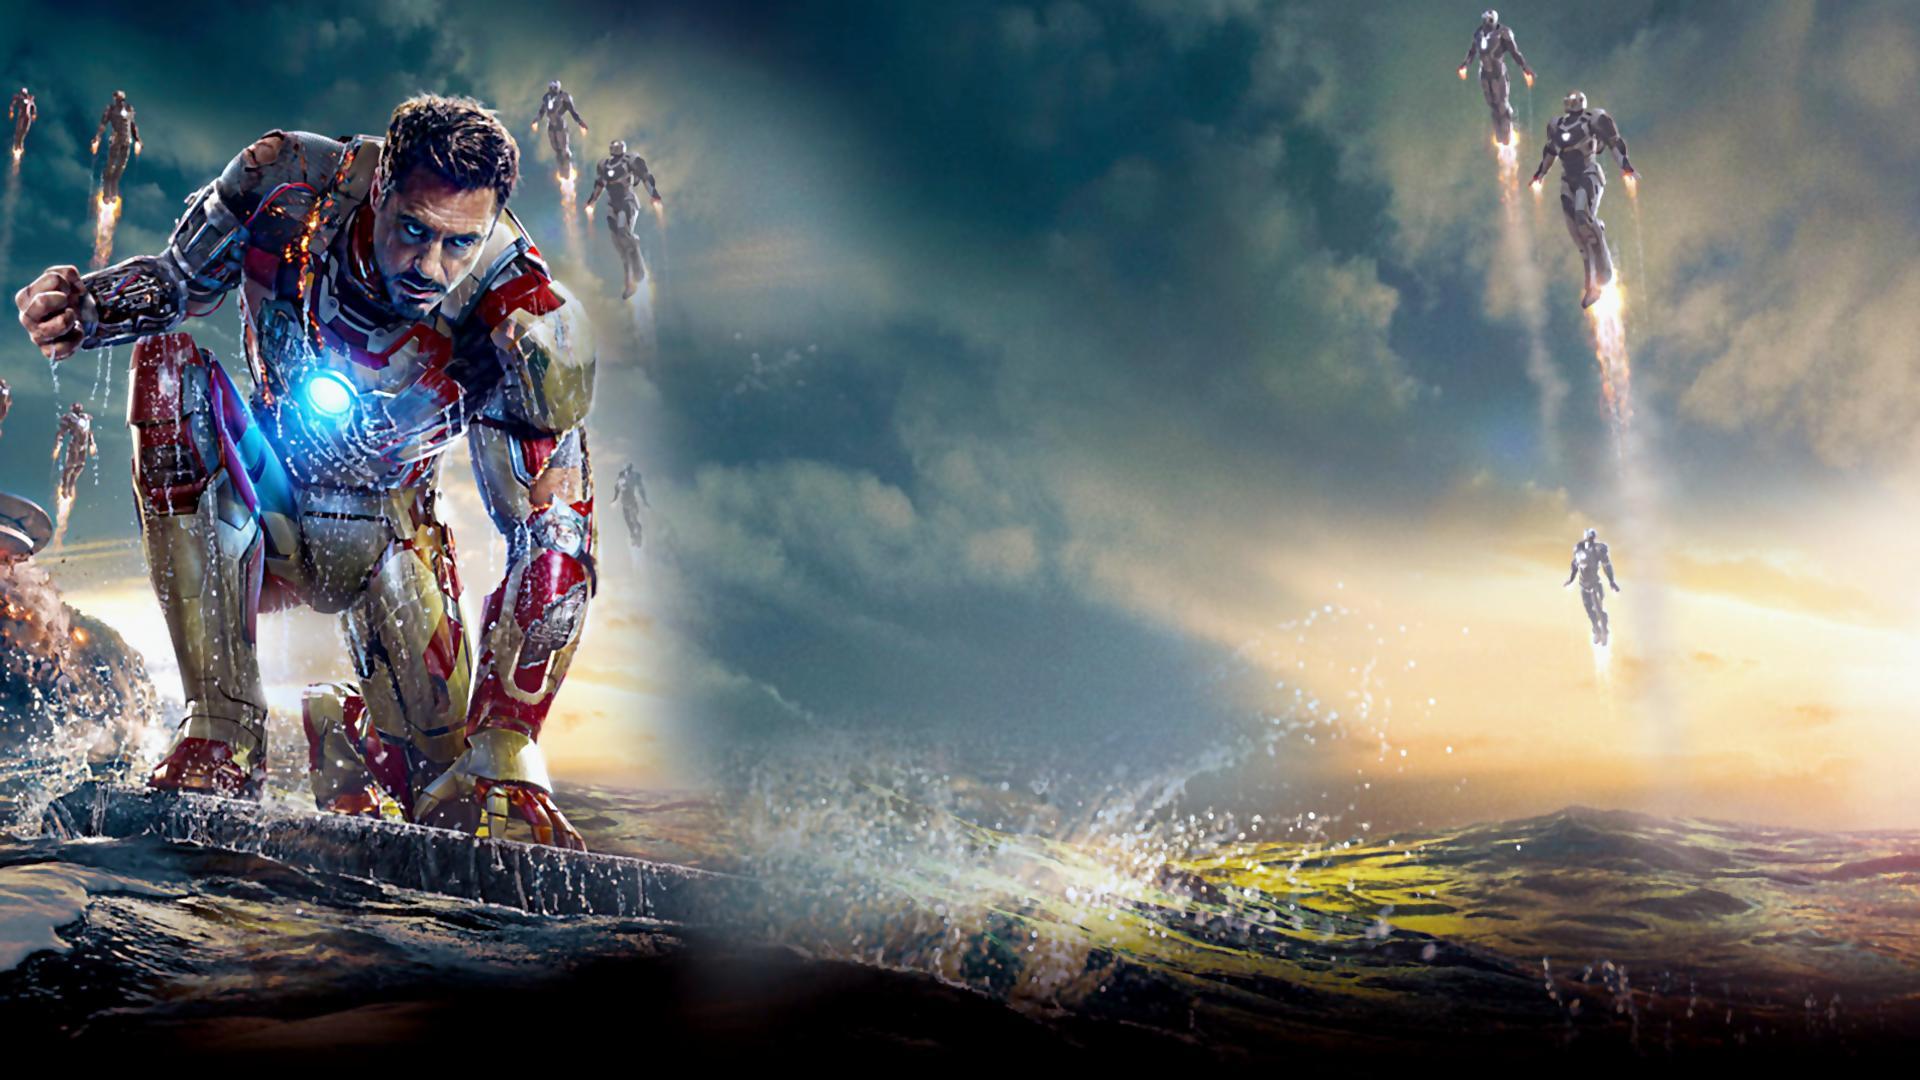 Tony Stark Hd Wallpapers Iron Man Wallpapers Hd Free Download Pixelstalk Net